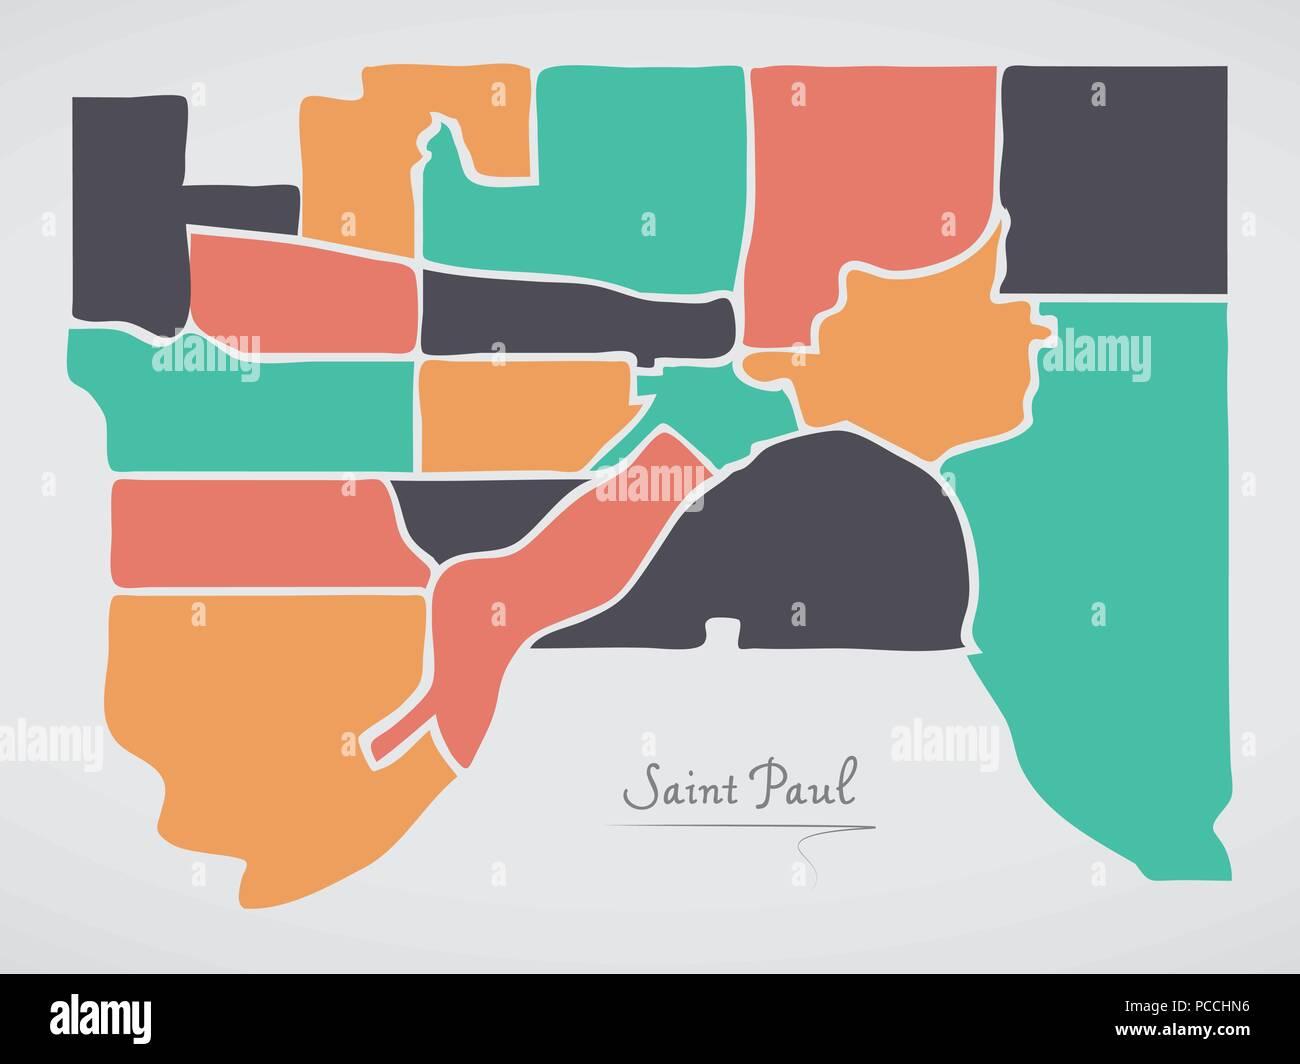 United America Map Minnesota Territory Stock Photos & United ... on new hampshire united states map, minneapolis map, nevada united states map, wage statistics united states map,